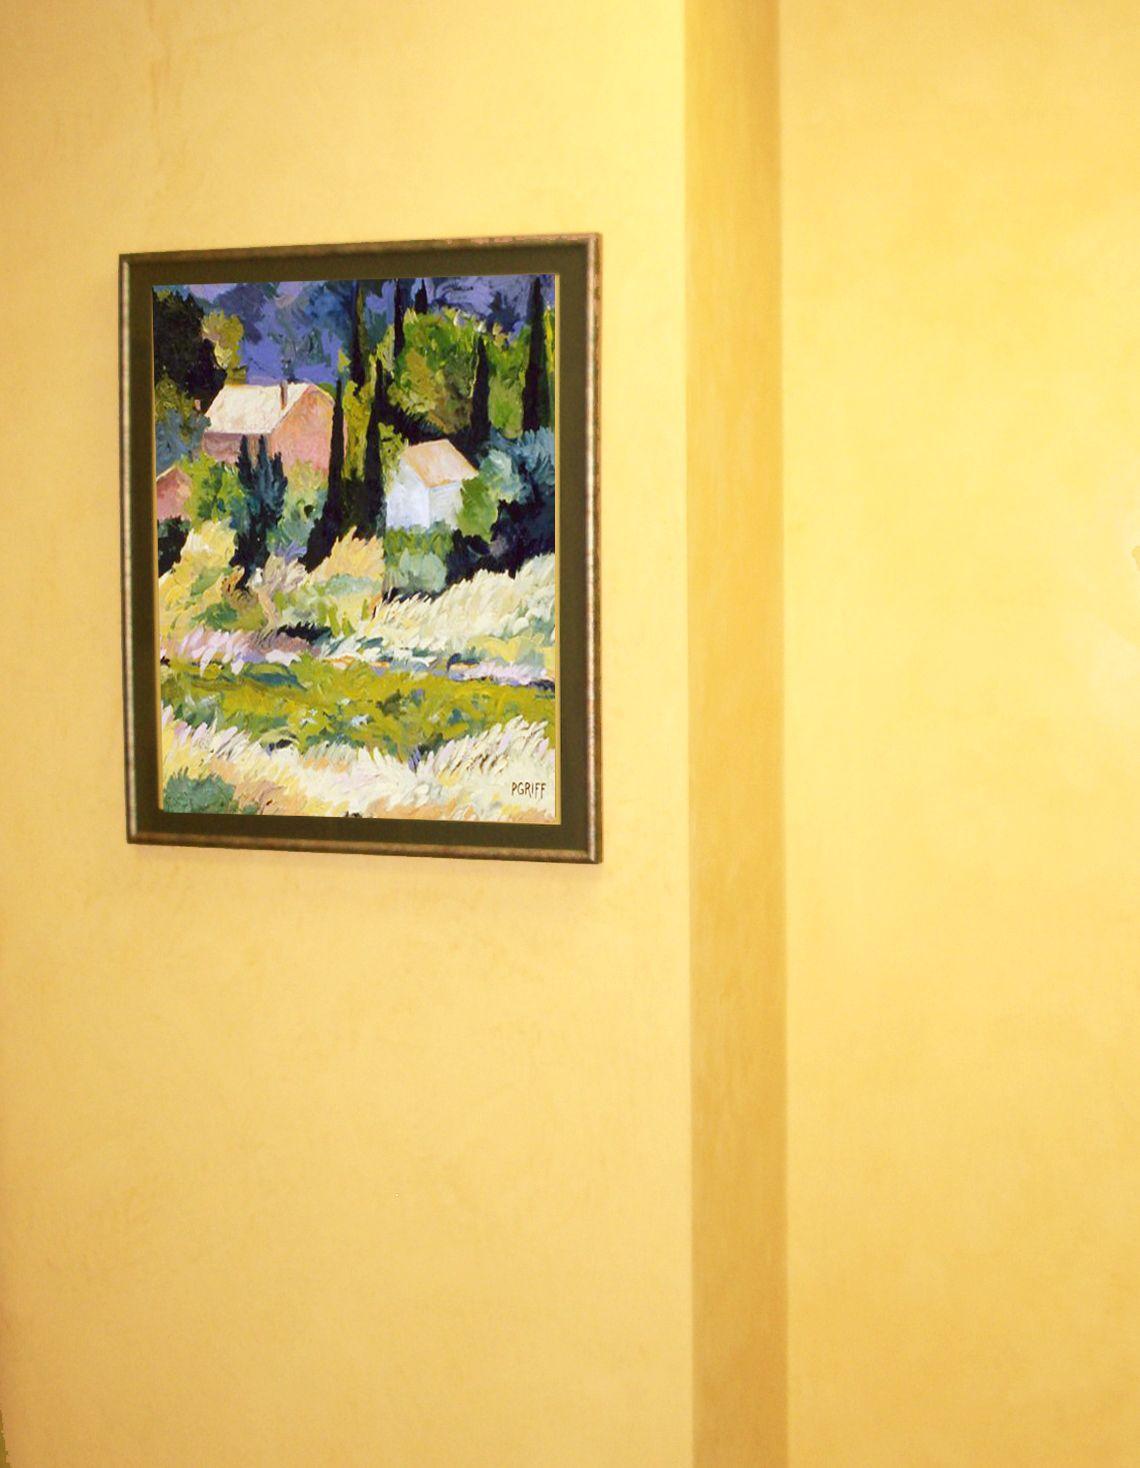 Naples Yellow interior wall color | fun colors | Pinterest ...